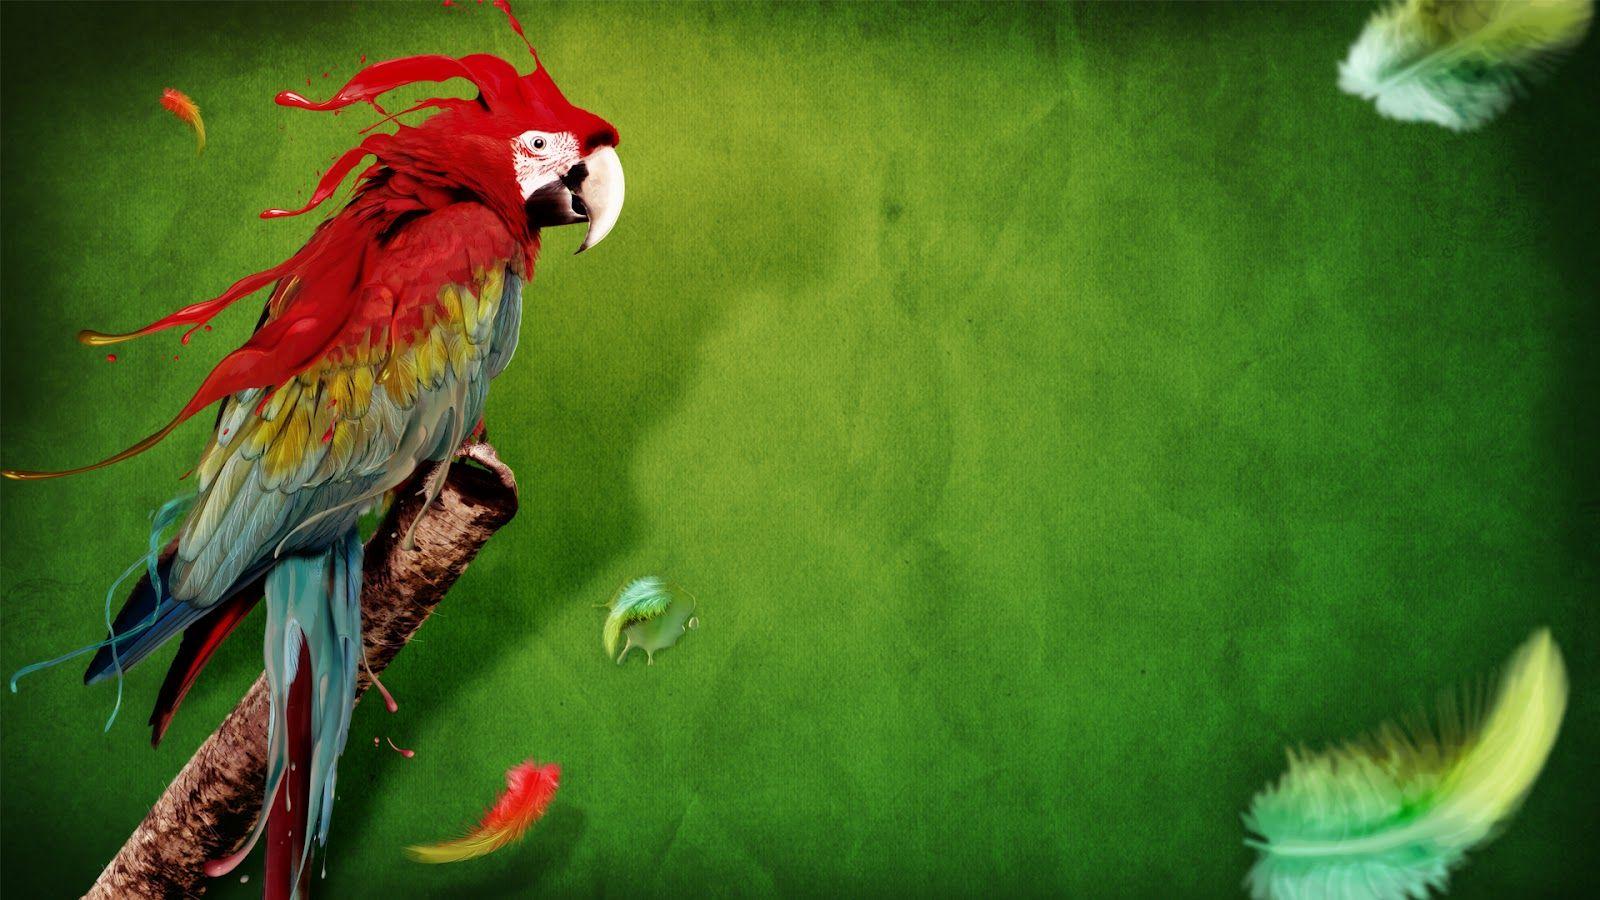 Parrot Colors Abstract Digital Art Hd Wallpapers Free Desktop Wallpaper Parrot Wallpaper Abstract Digital Art Nature Birds